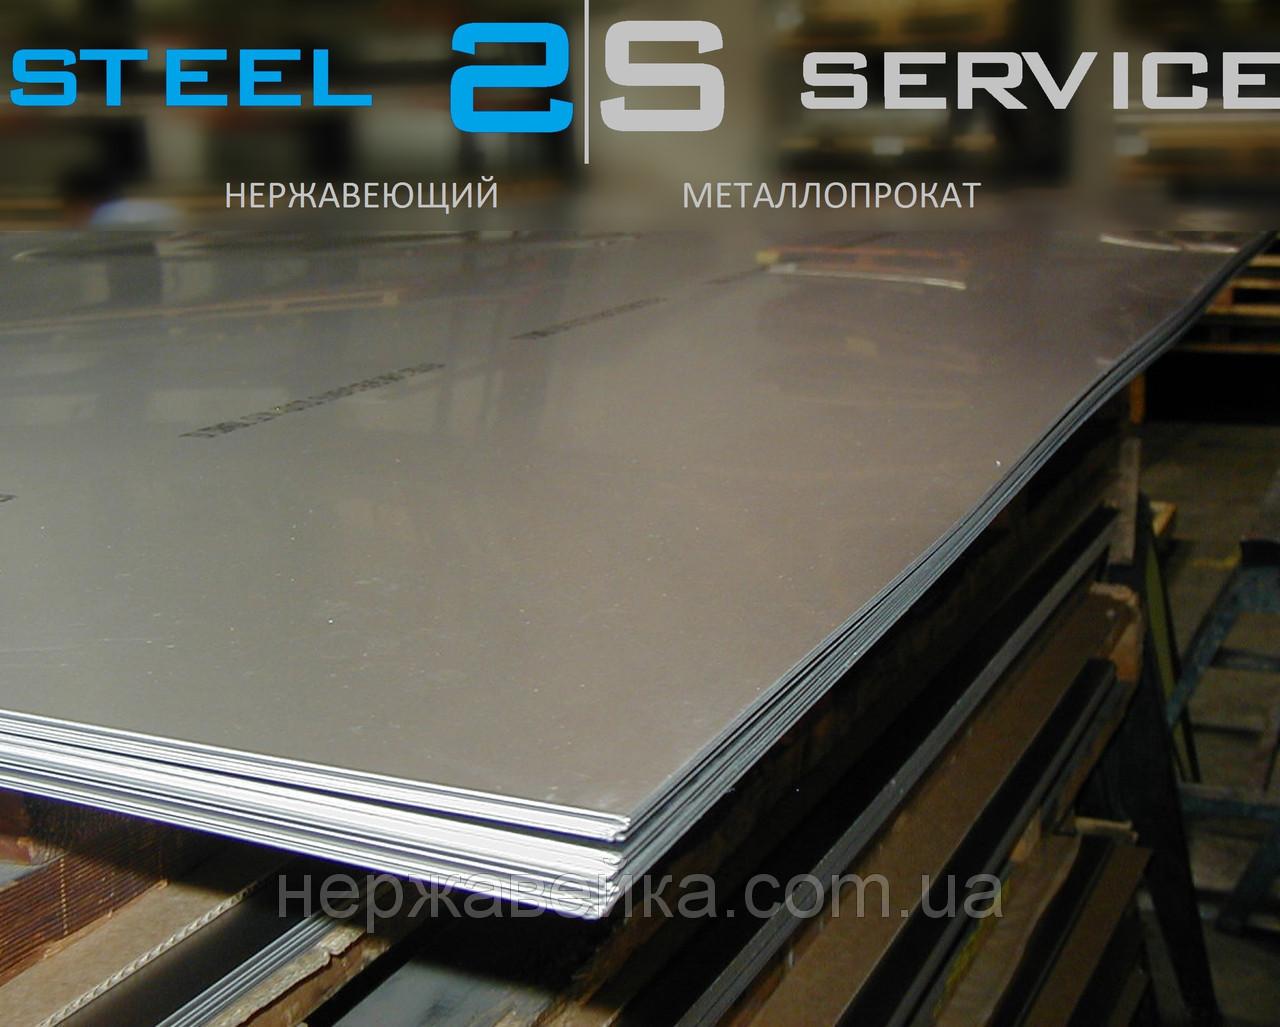 Нержавеющий лист 4х1500х6000мм AISI 430(12Х17) 2B - матовый, технический